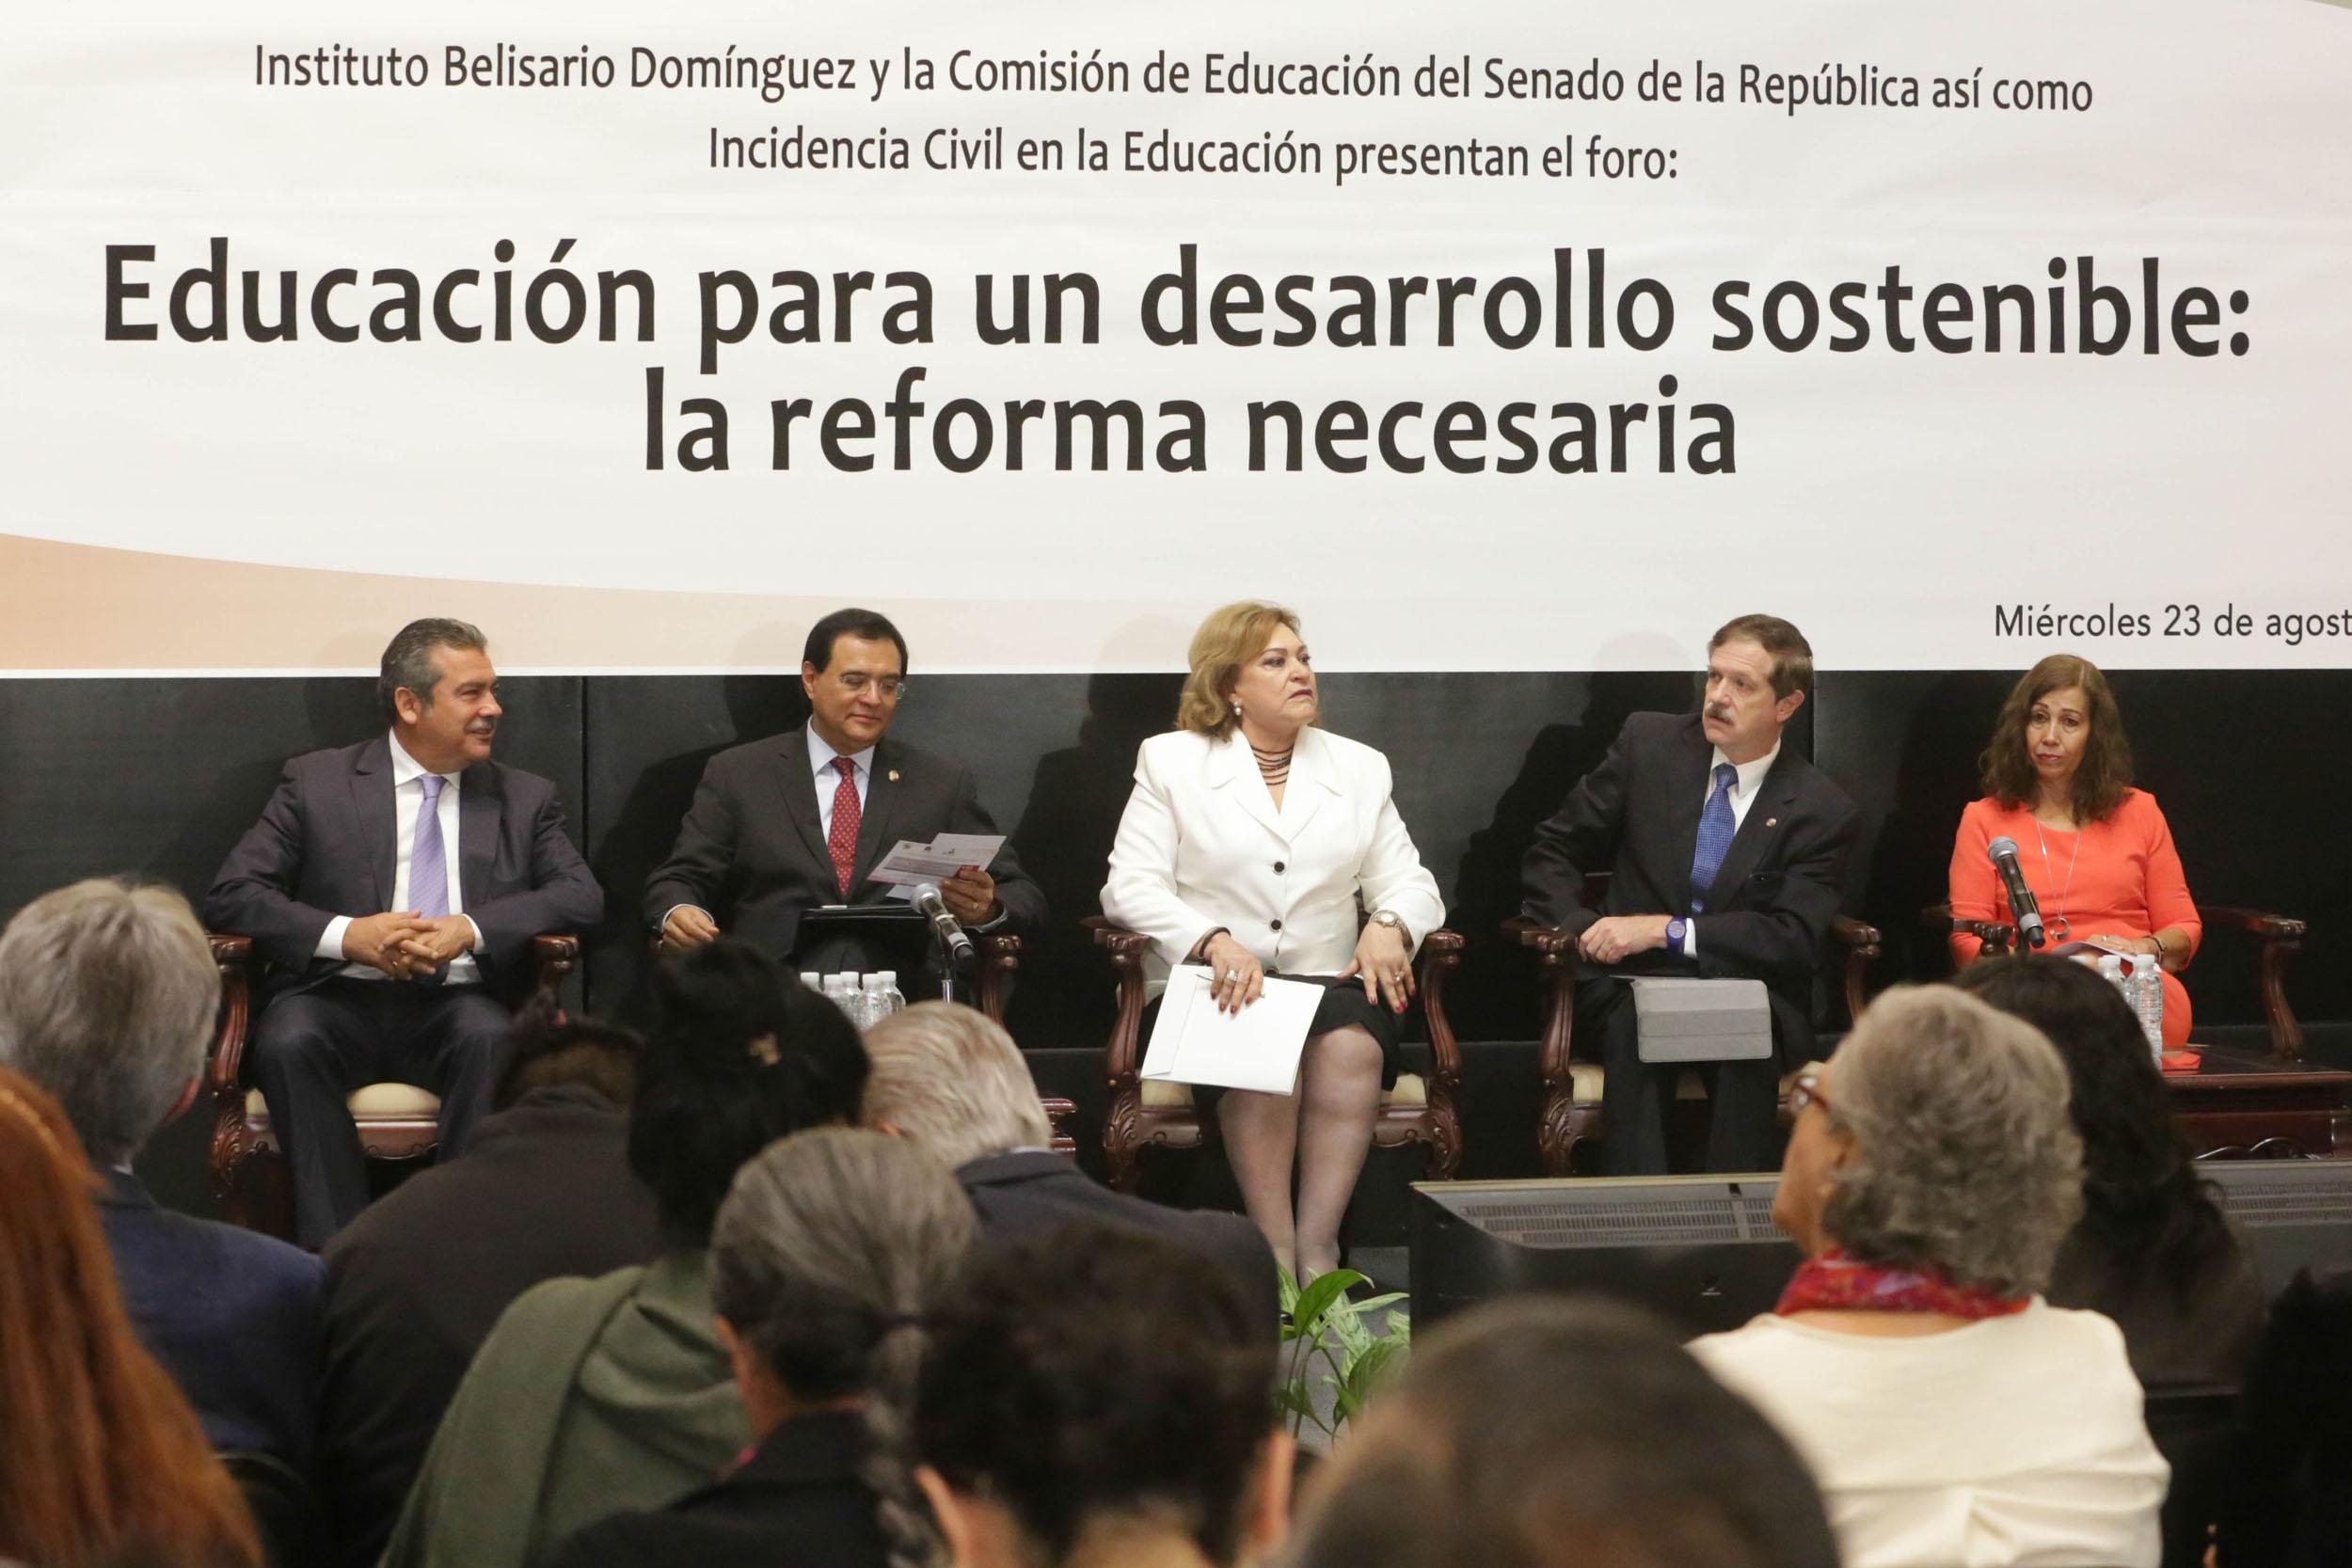 https://paginabierta.mx/wp-content/uploads/2017/08/26edu.jpg